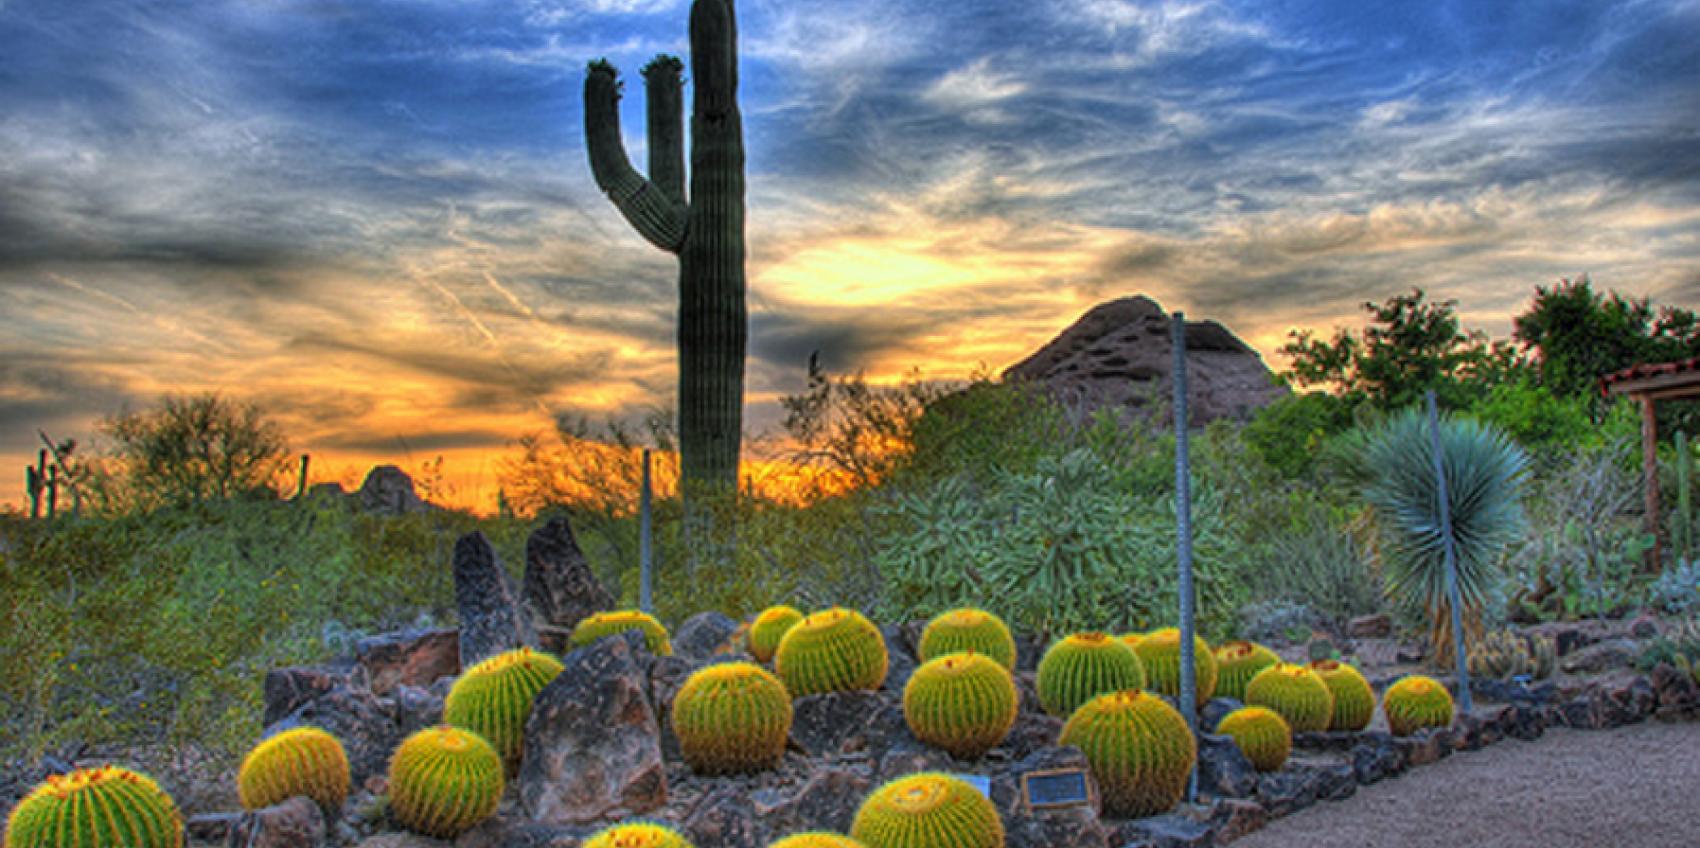 desert botanical garden - Phoenix Desert Botanical Garden